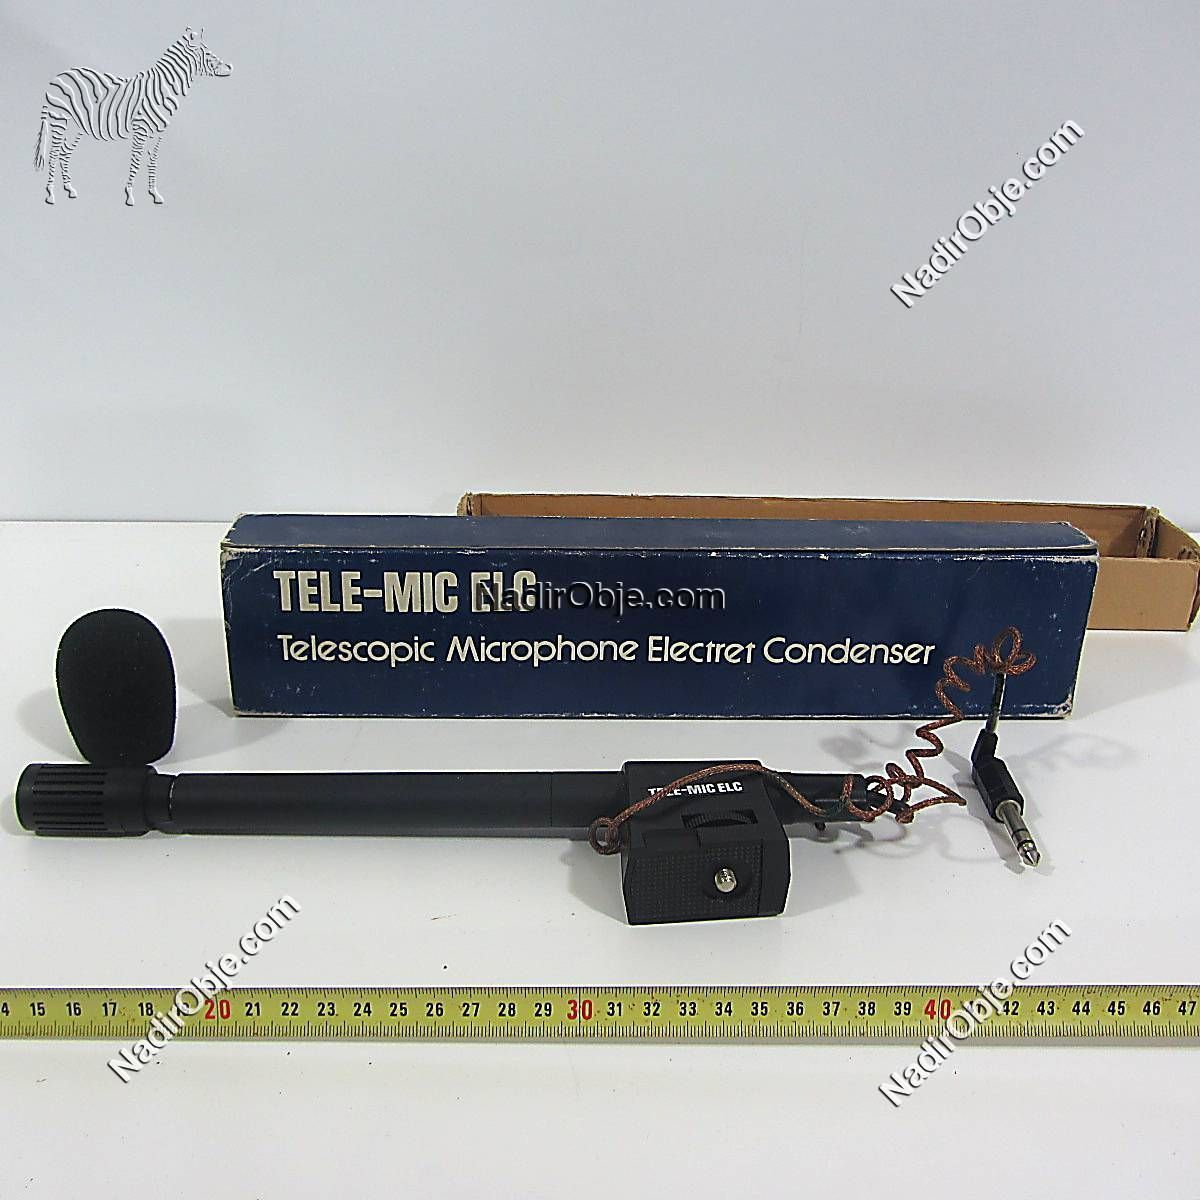 Tele-Mic Mikrofon Mekanik-Elektrikli Objeler Mikrofon